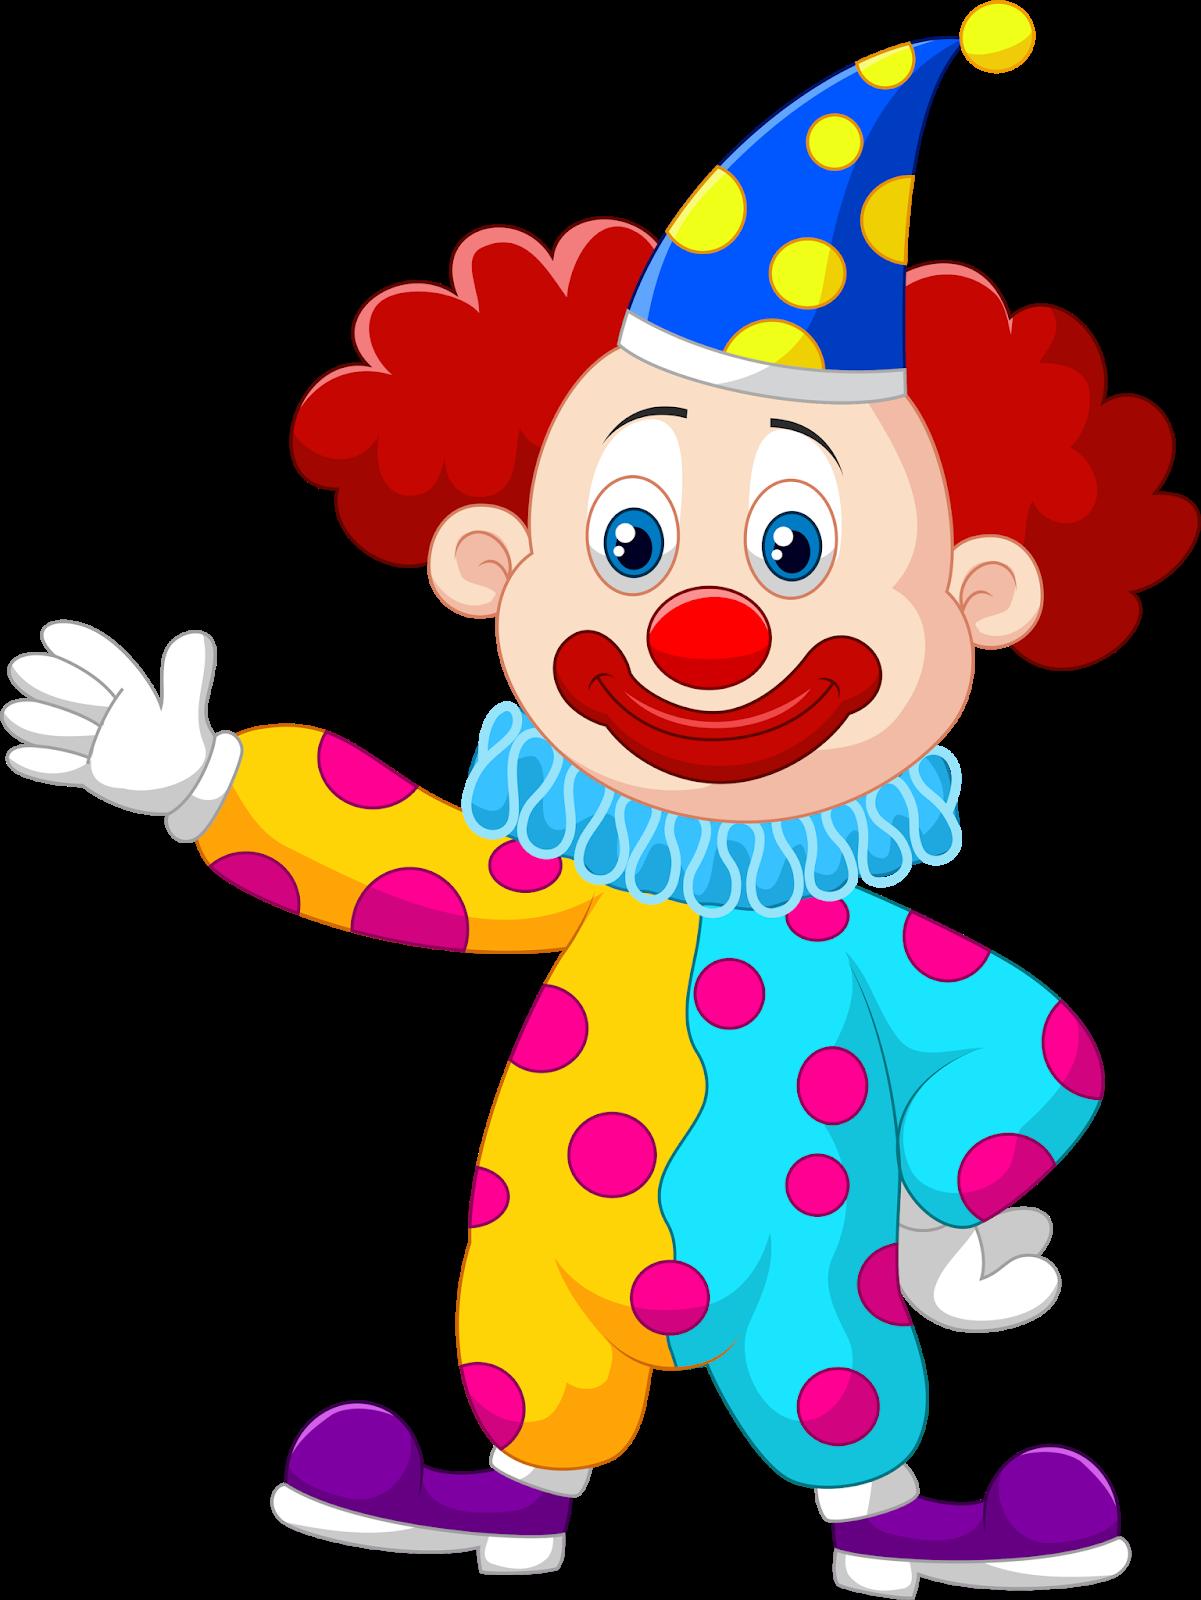 Открытки, рисунки веселого клоуна